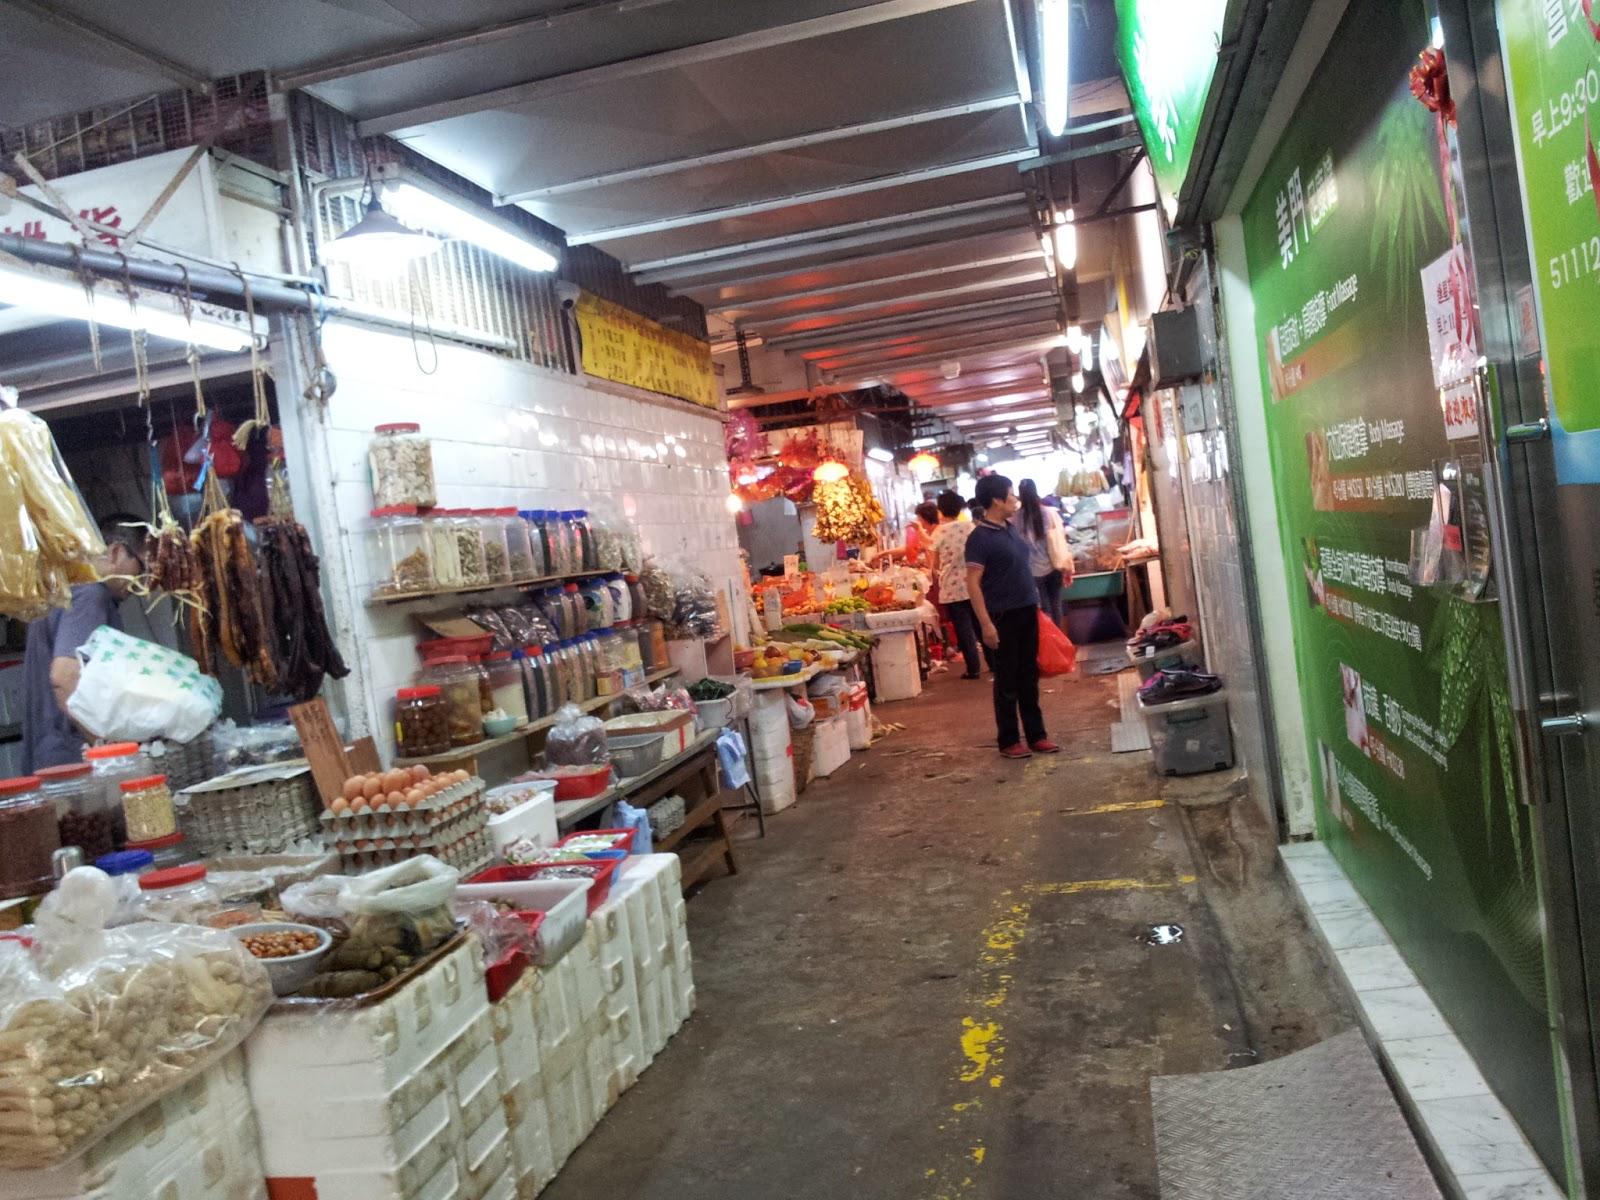 Grassroots O2: [領匯商場] 瀝源廣場 @2014-11-01